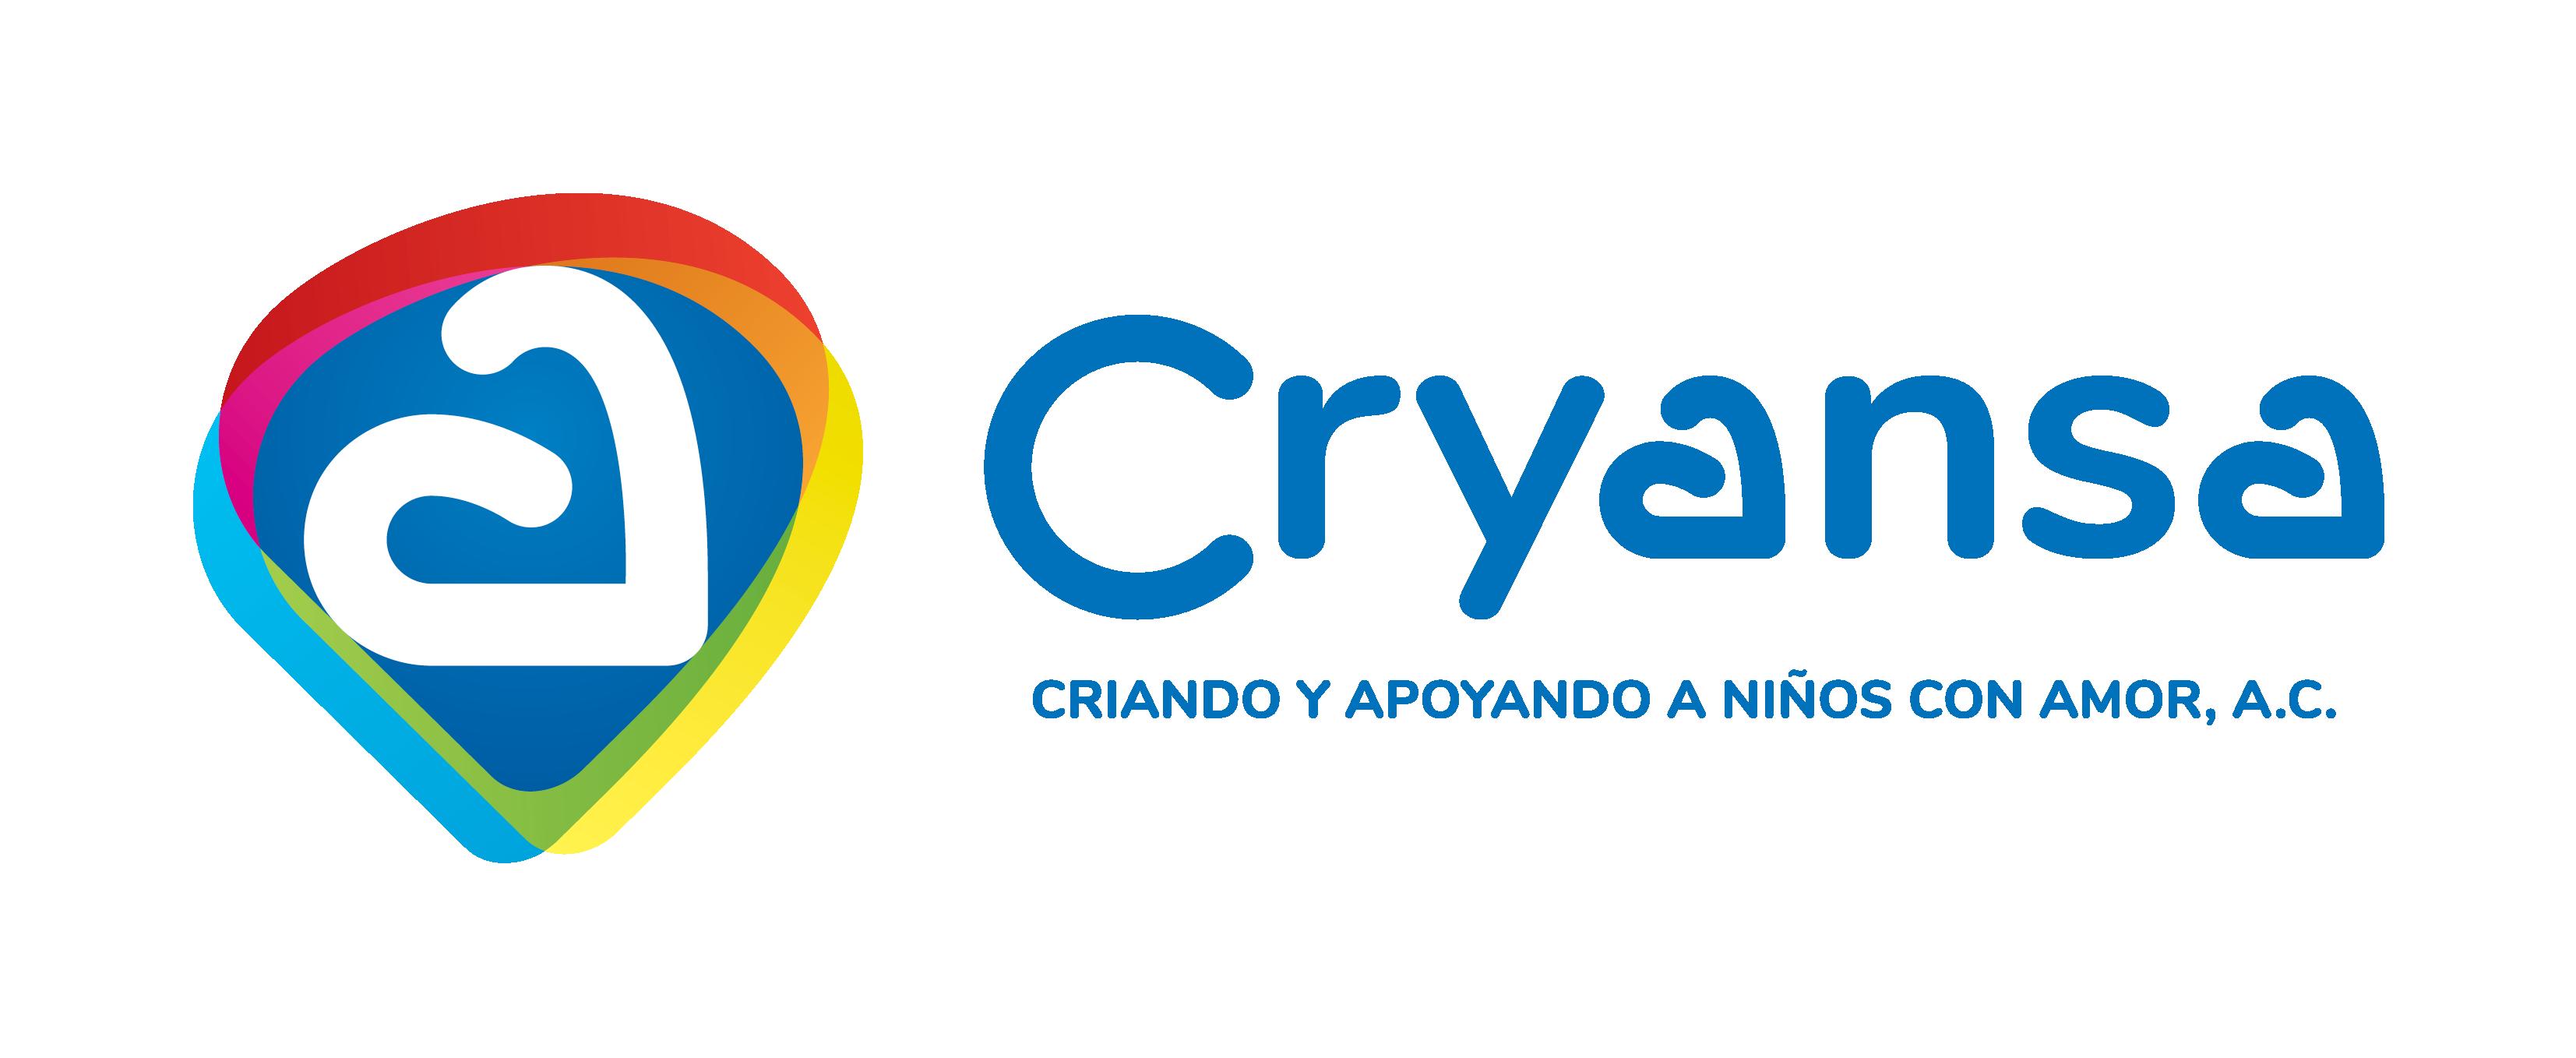 Cryansa